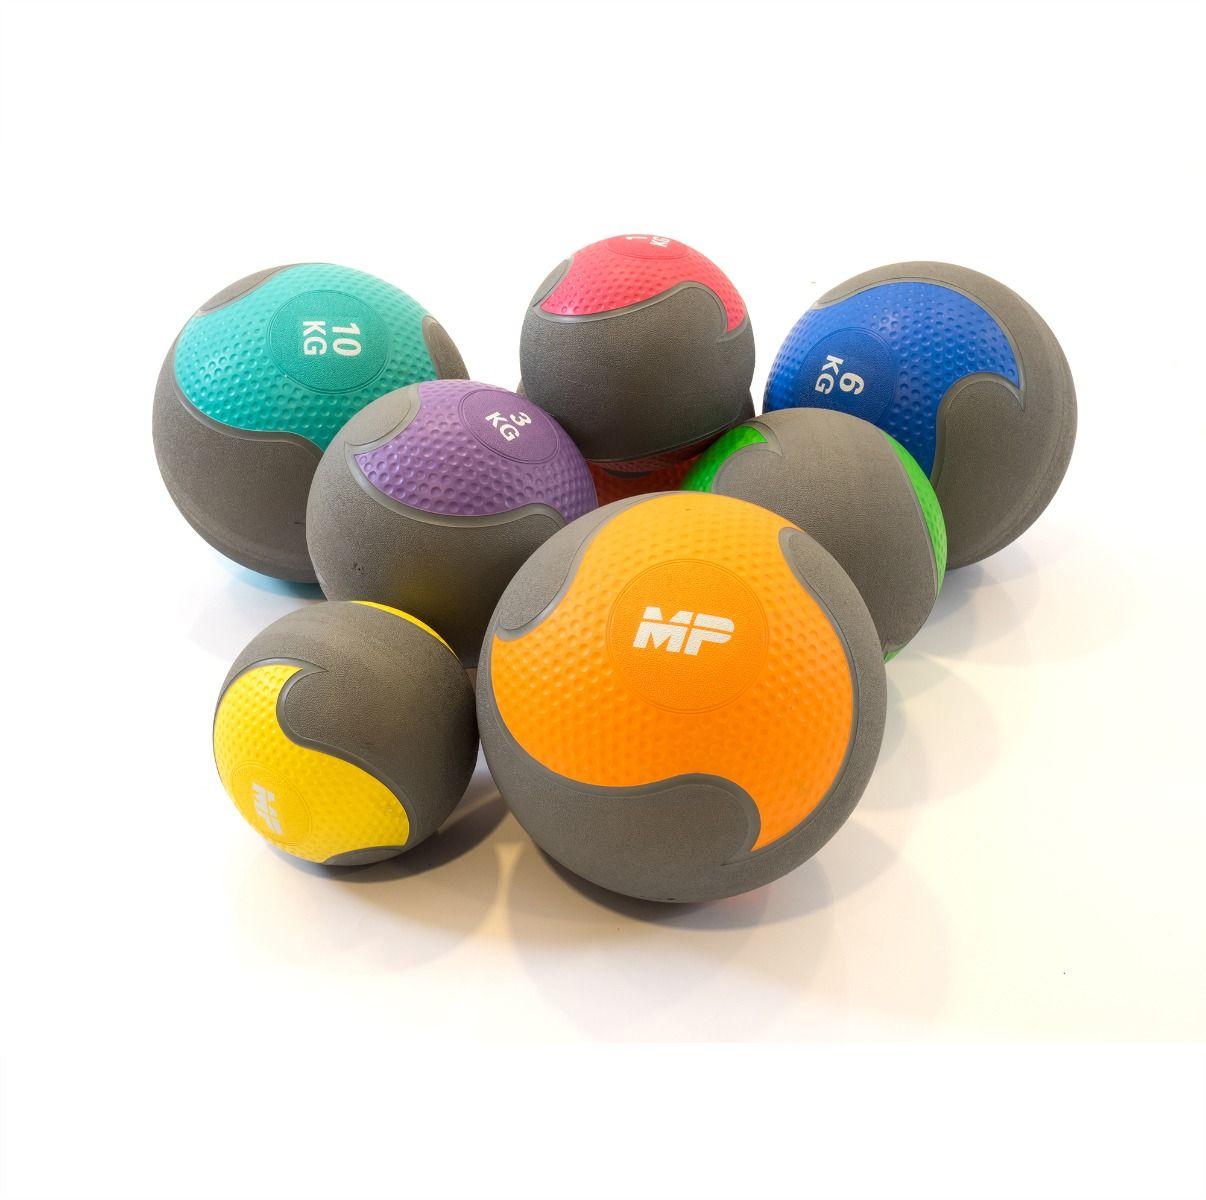 rubber medicijnballen 1 10 kg per stuk mp1008 muscle powerrubber medicijnballen 1kg 2kg 3kg 4kg 5kg 6kg 8kg en 10kg per stuk leverbaar mp1006